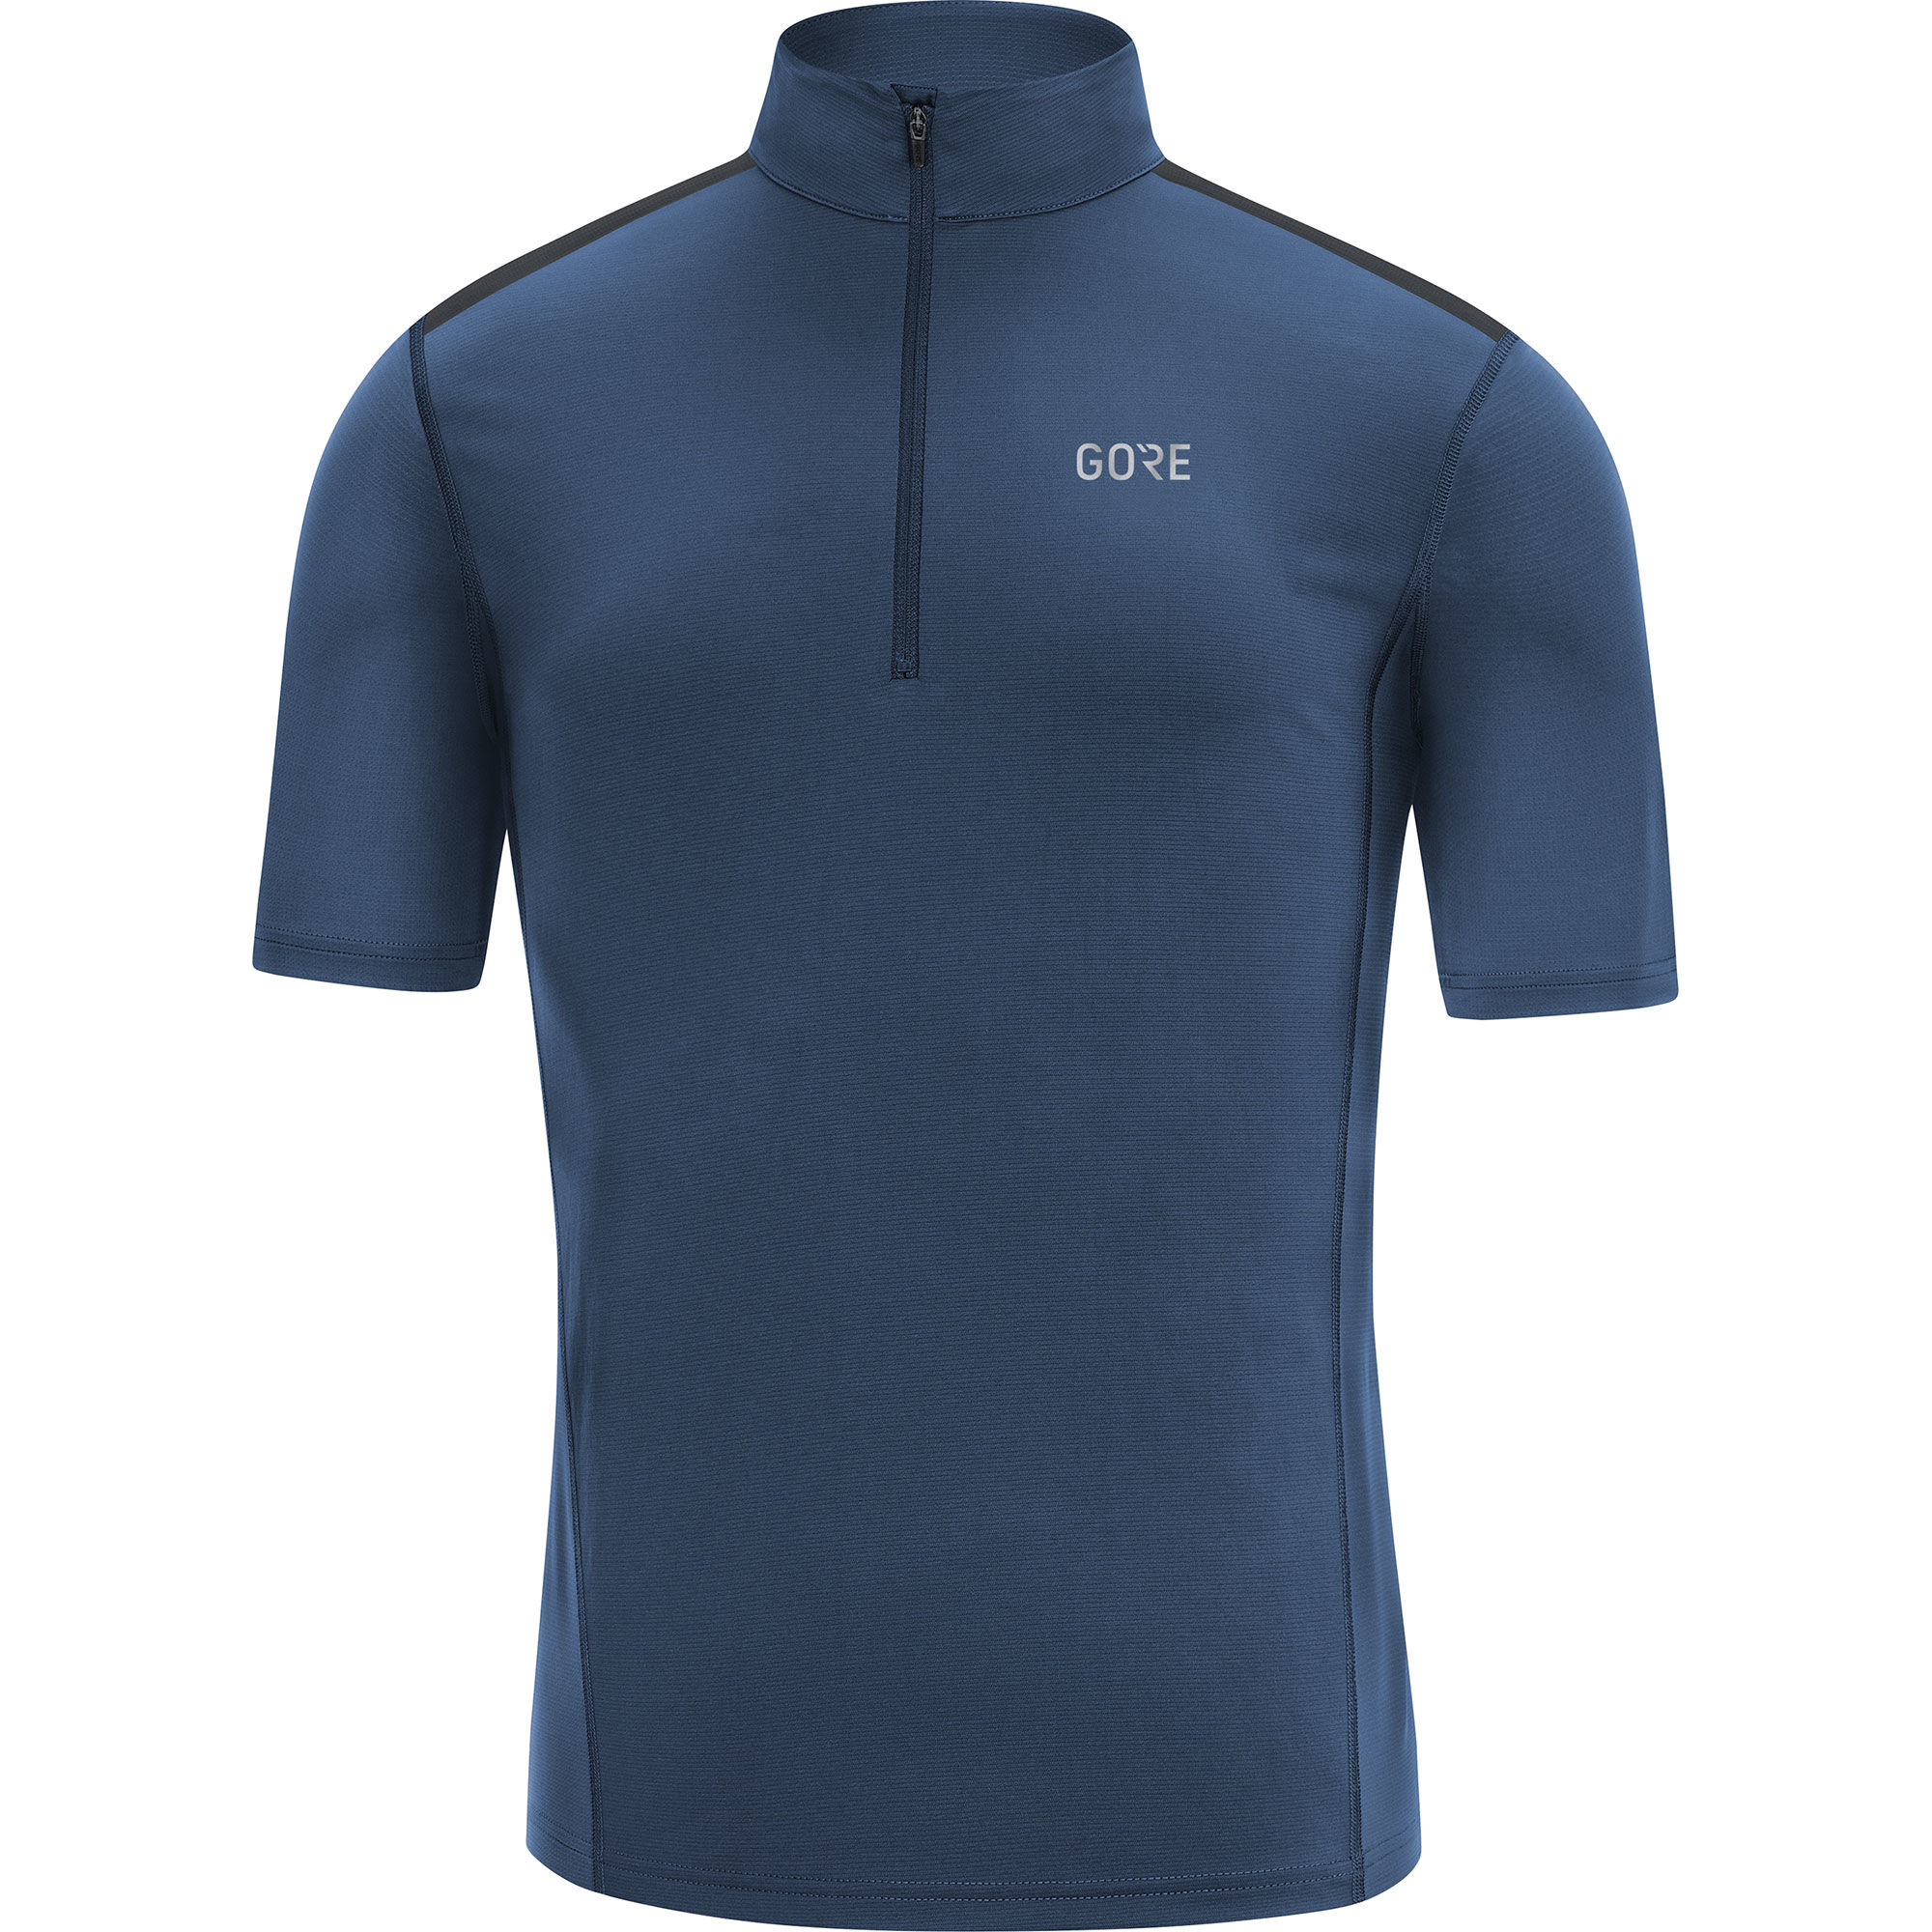 Gore R5 Zip Shirt in Blau